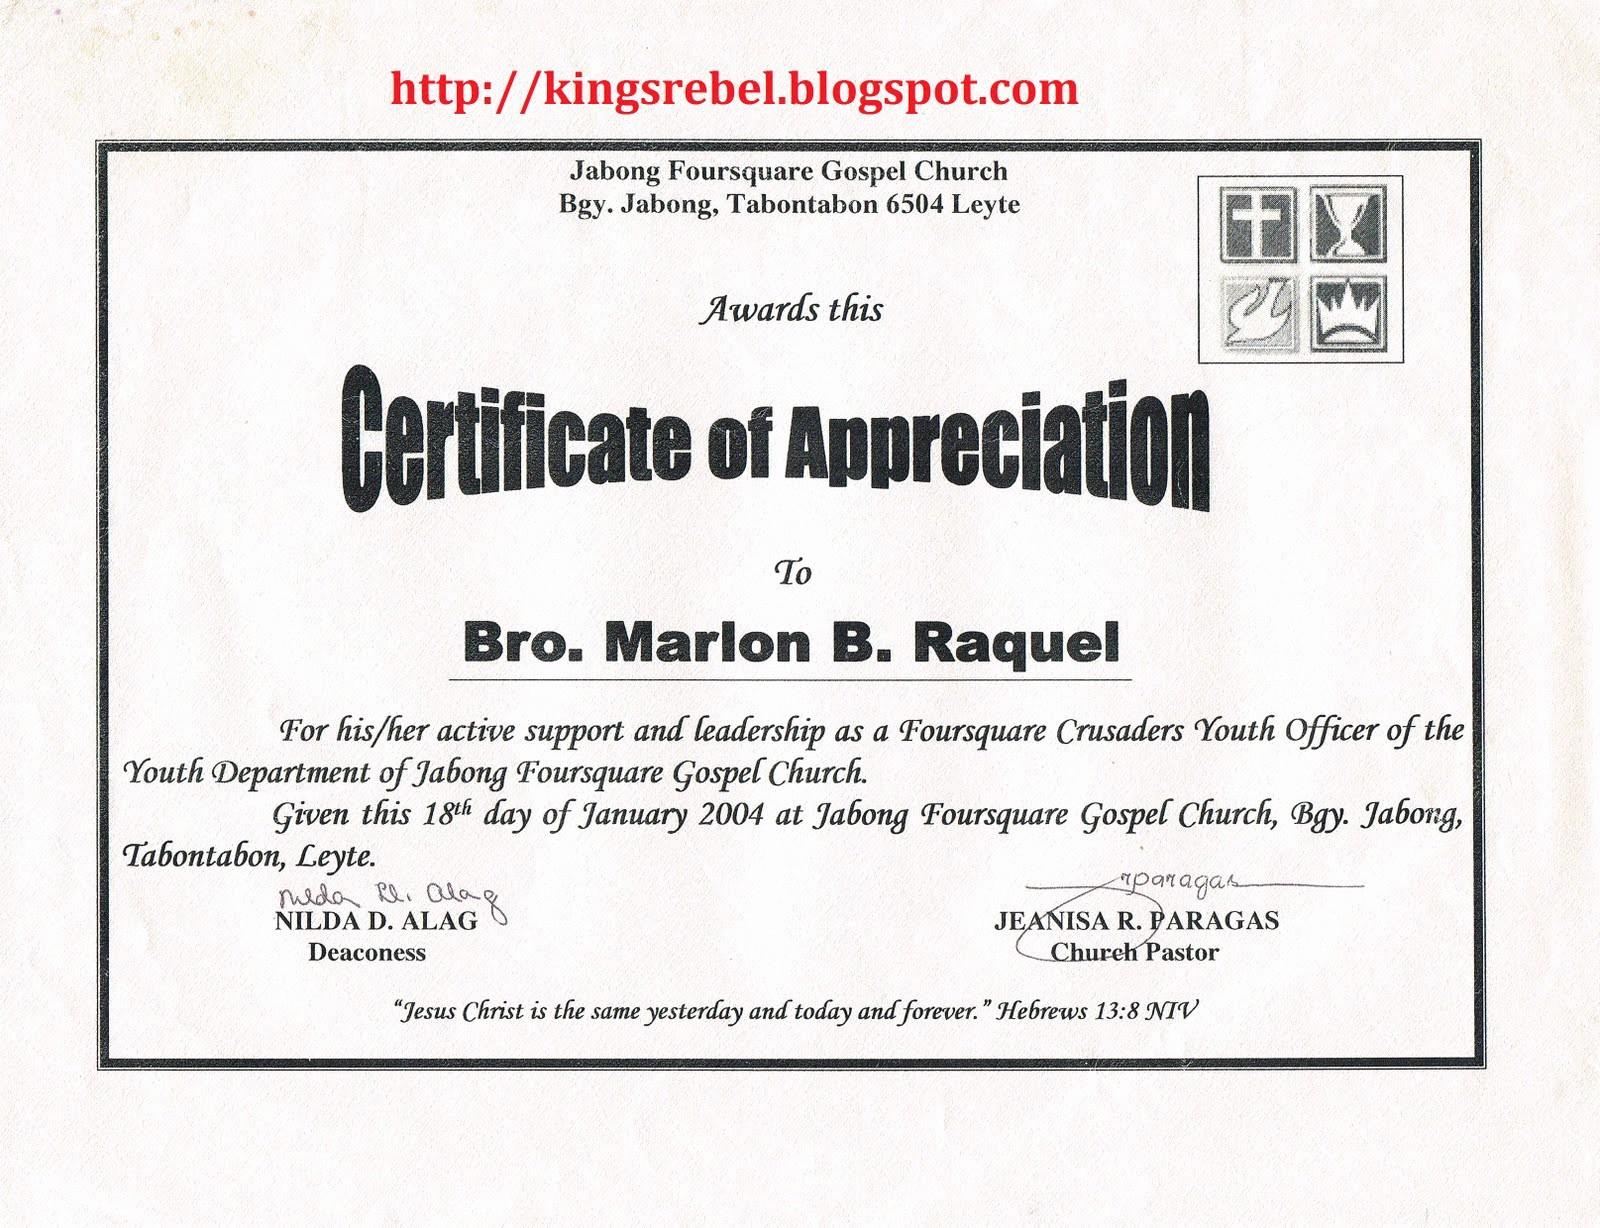 Example Of Certificate Of Appreciation Unique Tidbits and bytes Example Of Certificate Of Appreciation